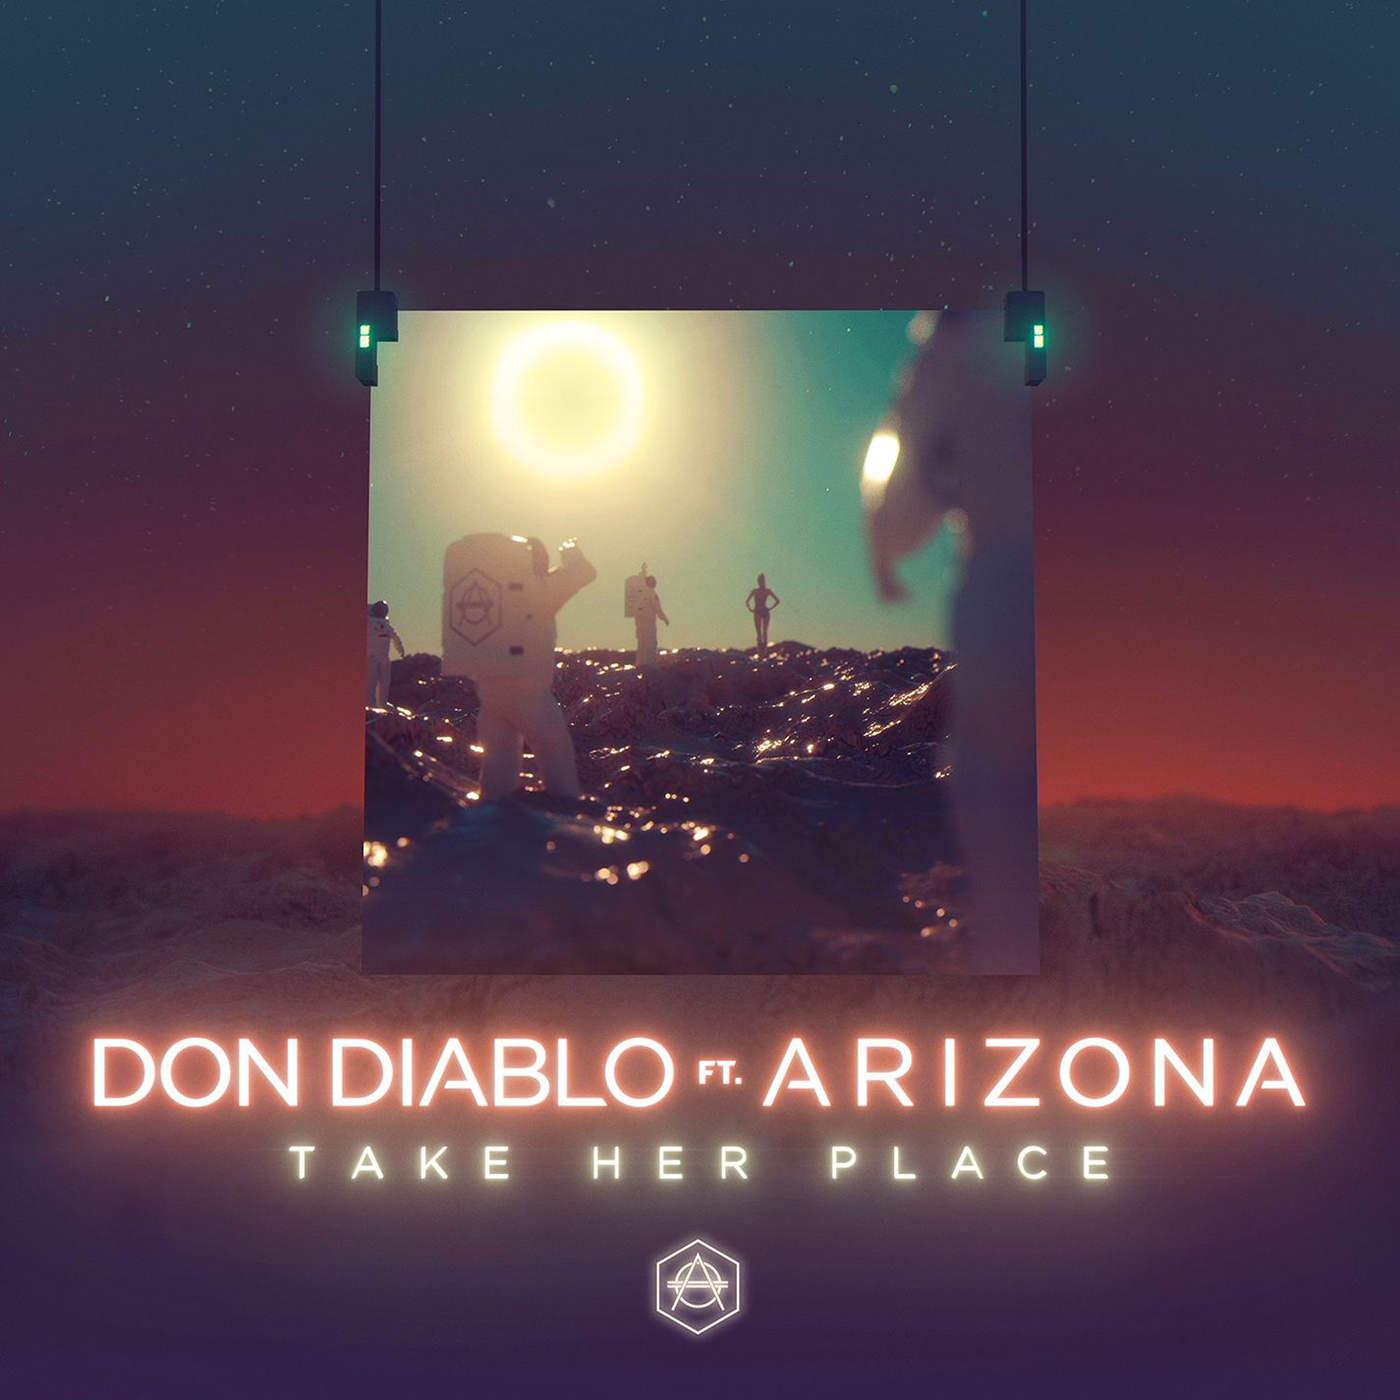 Don Diablo - Take Her Place (feat. A R I Z O N A) - Single